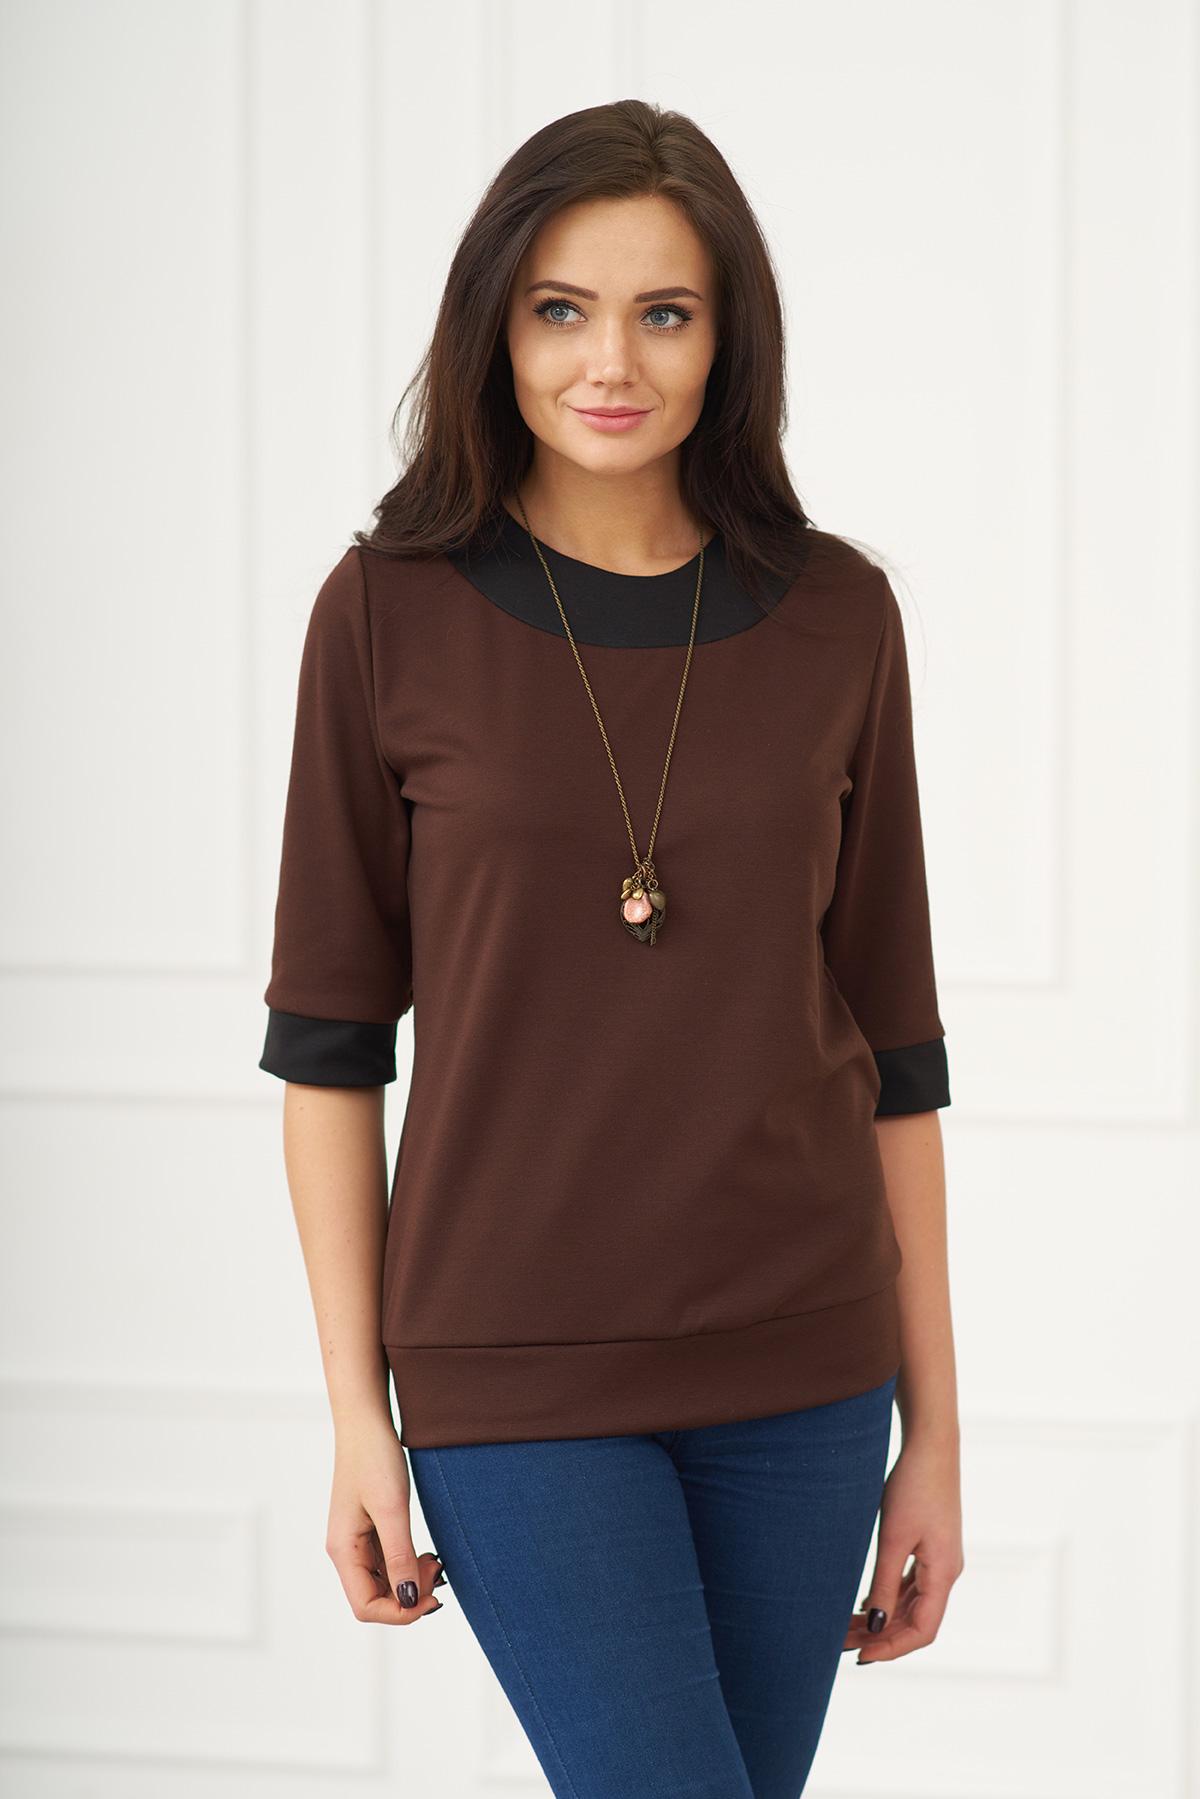 Жен. блуза арт. 19-0091 Шоколадный р. 54Блузы<br><br><br>Тип: Жен. блуза<br>Размер: 54<br>Материал: Милано